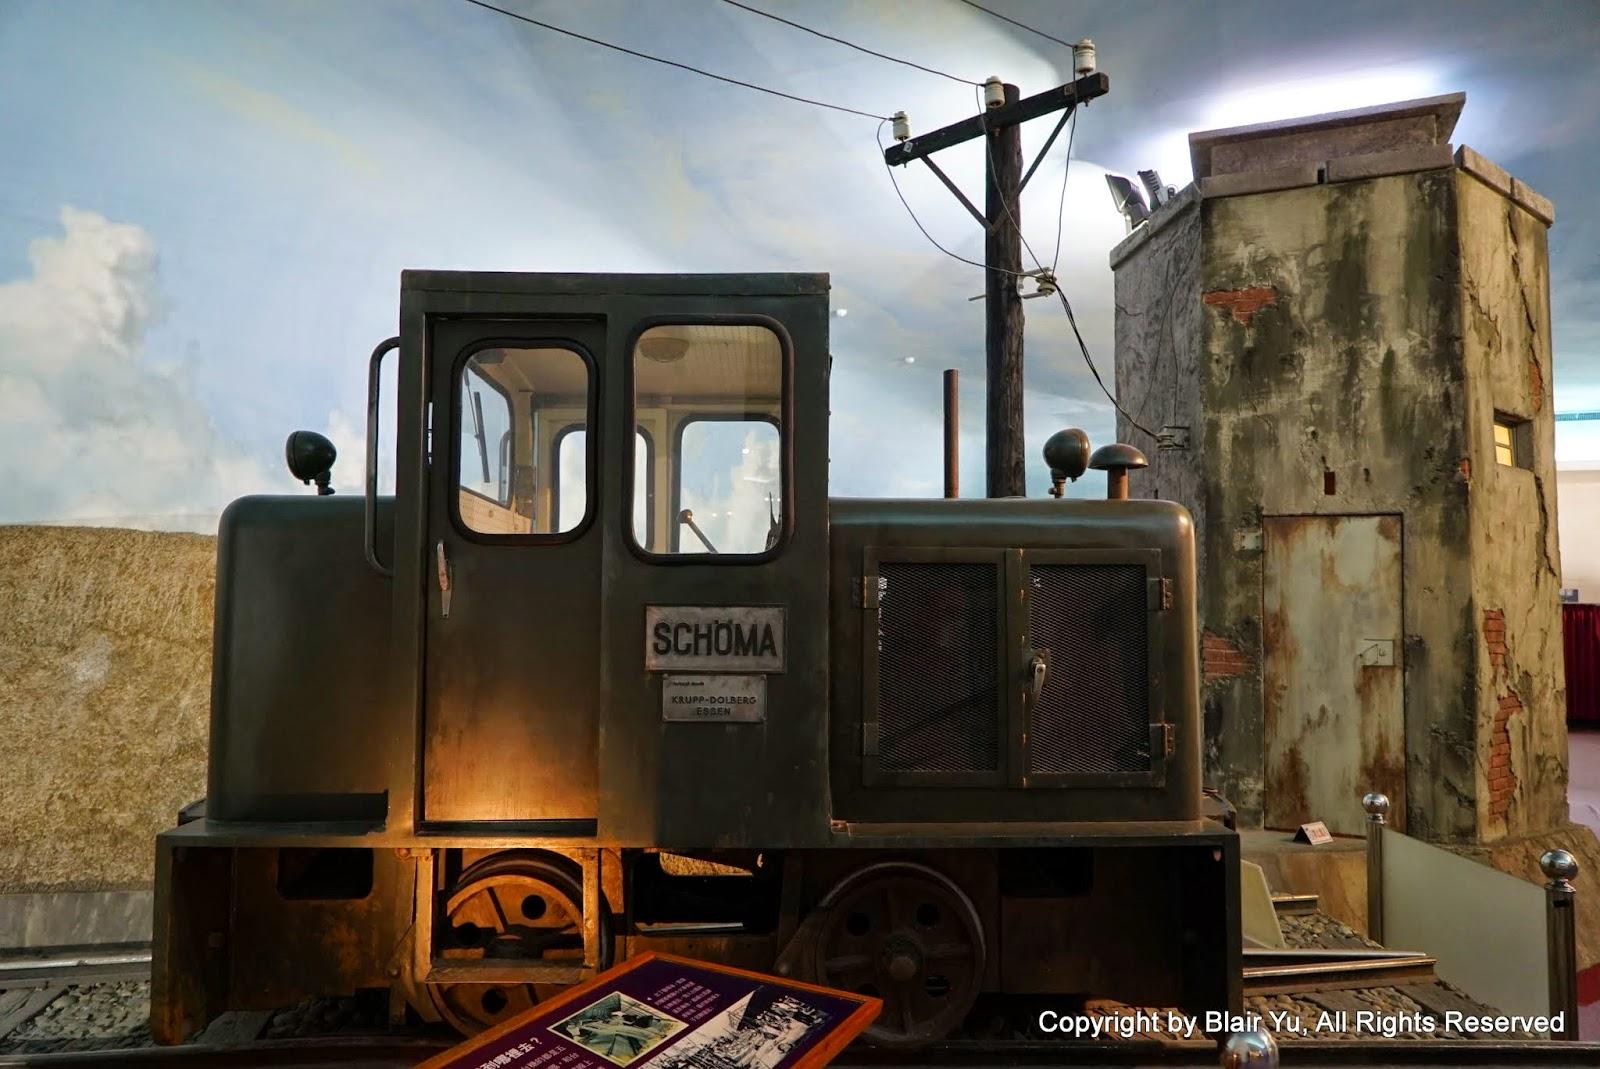 Blair's 鐵道攝影: 臺鹽運鹽用 SCHOMA 柴油機關車(臺灣鹽博物館)